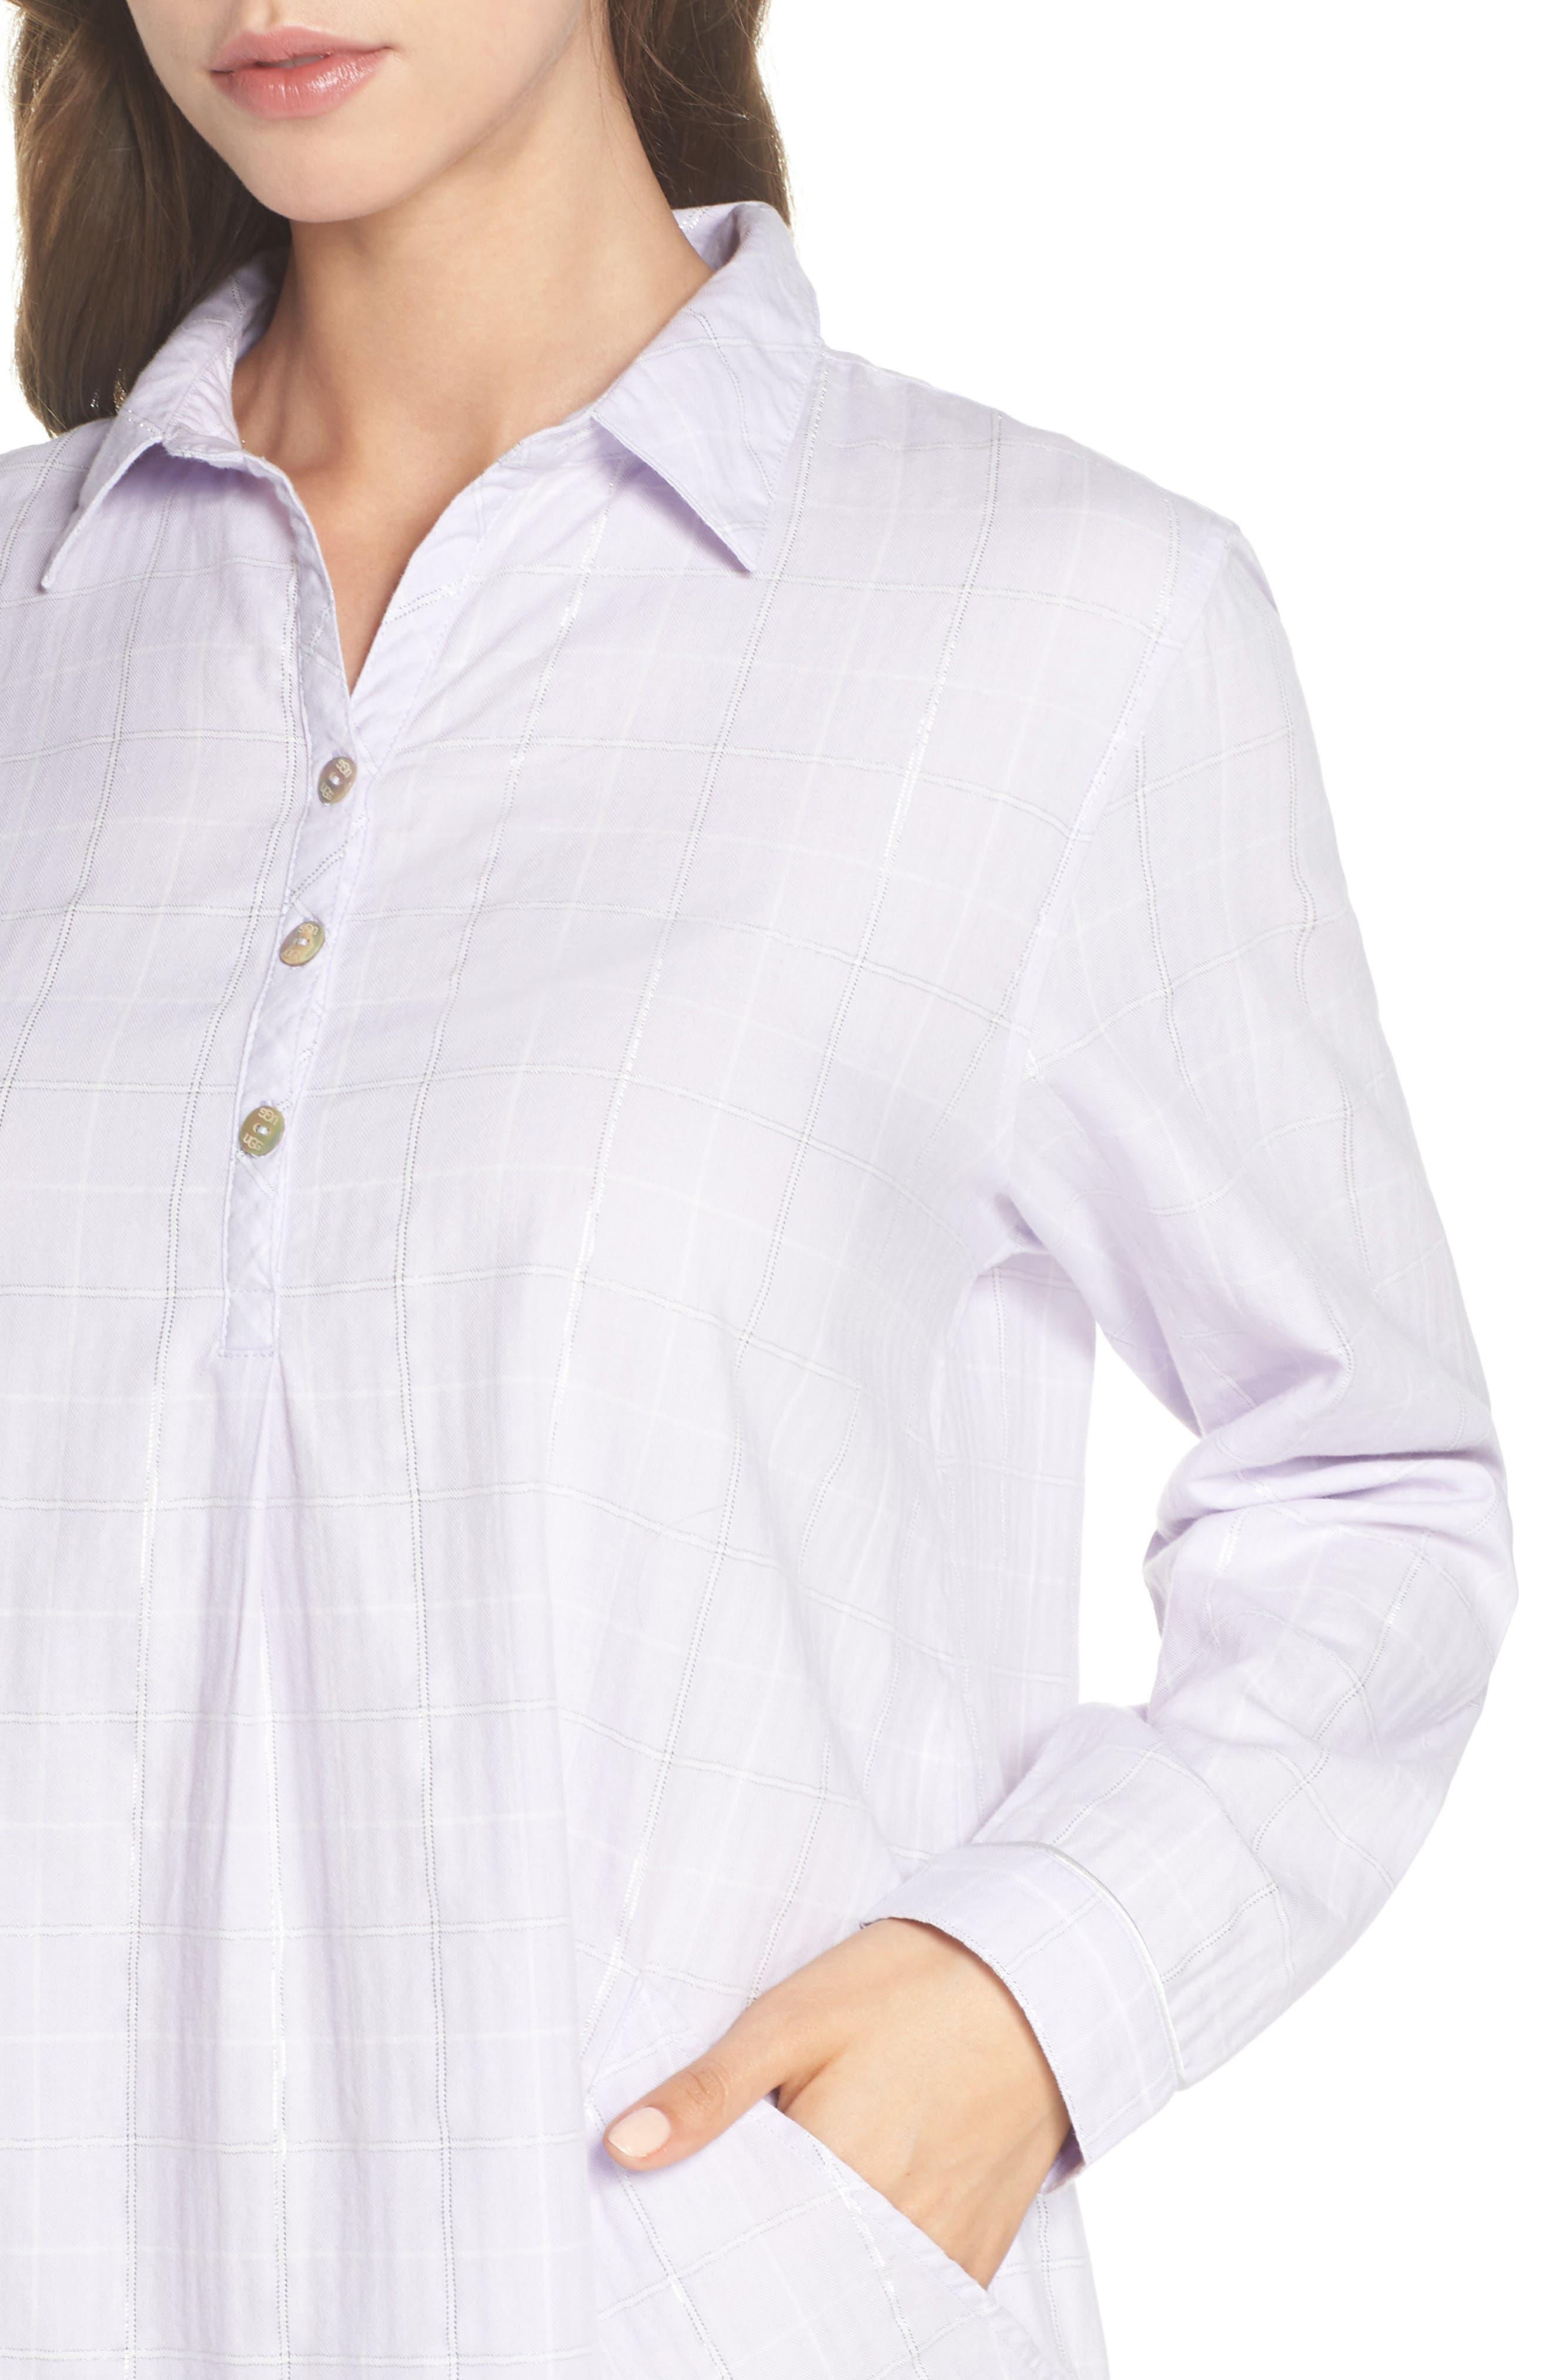 Gabri Sleep Shirt,                             Alternate thumbnail 5, color,                             Lavender Fog